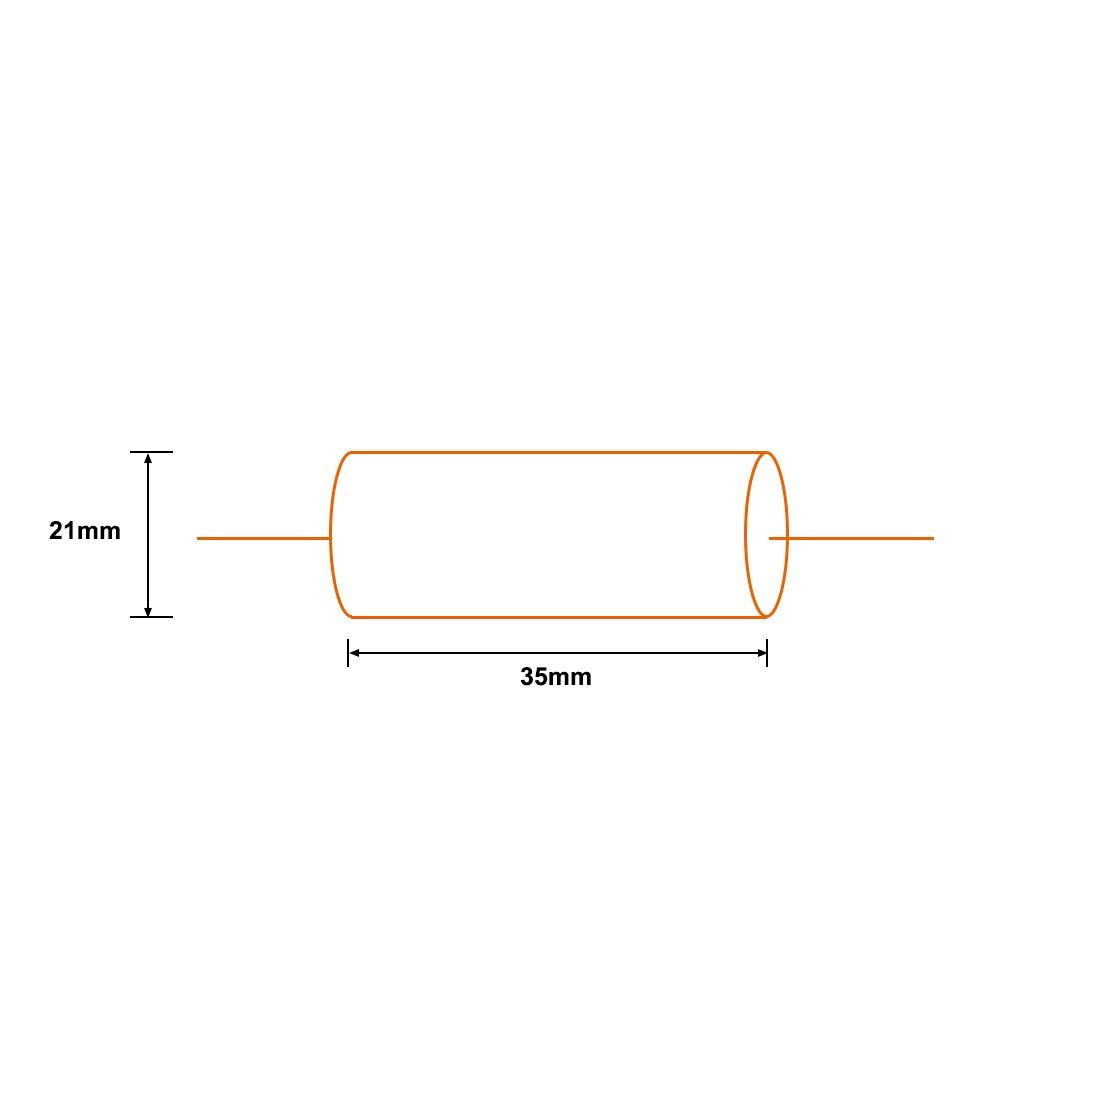 sourcing map Condensador de pel/ícula Redondo 5.6uF 250V DC Condensador de pel/ícula de poli/éster axial para Divisor de Audio Amarillo